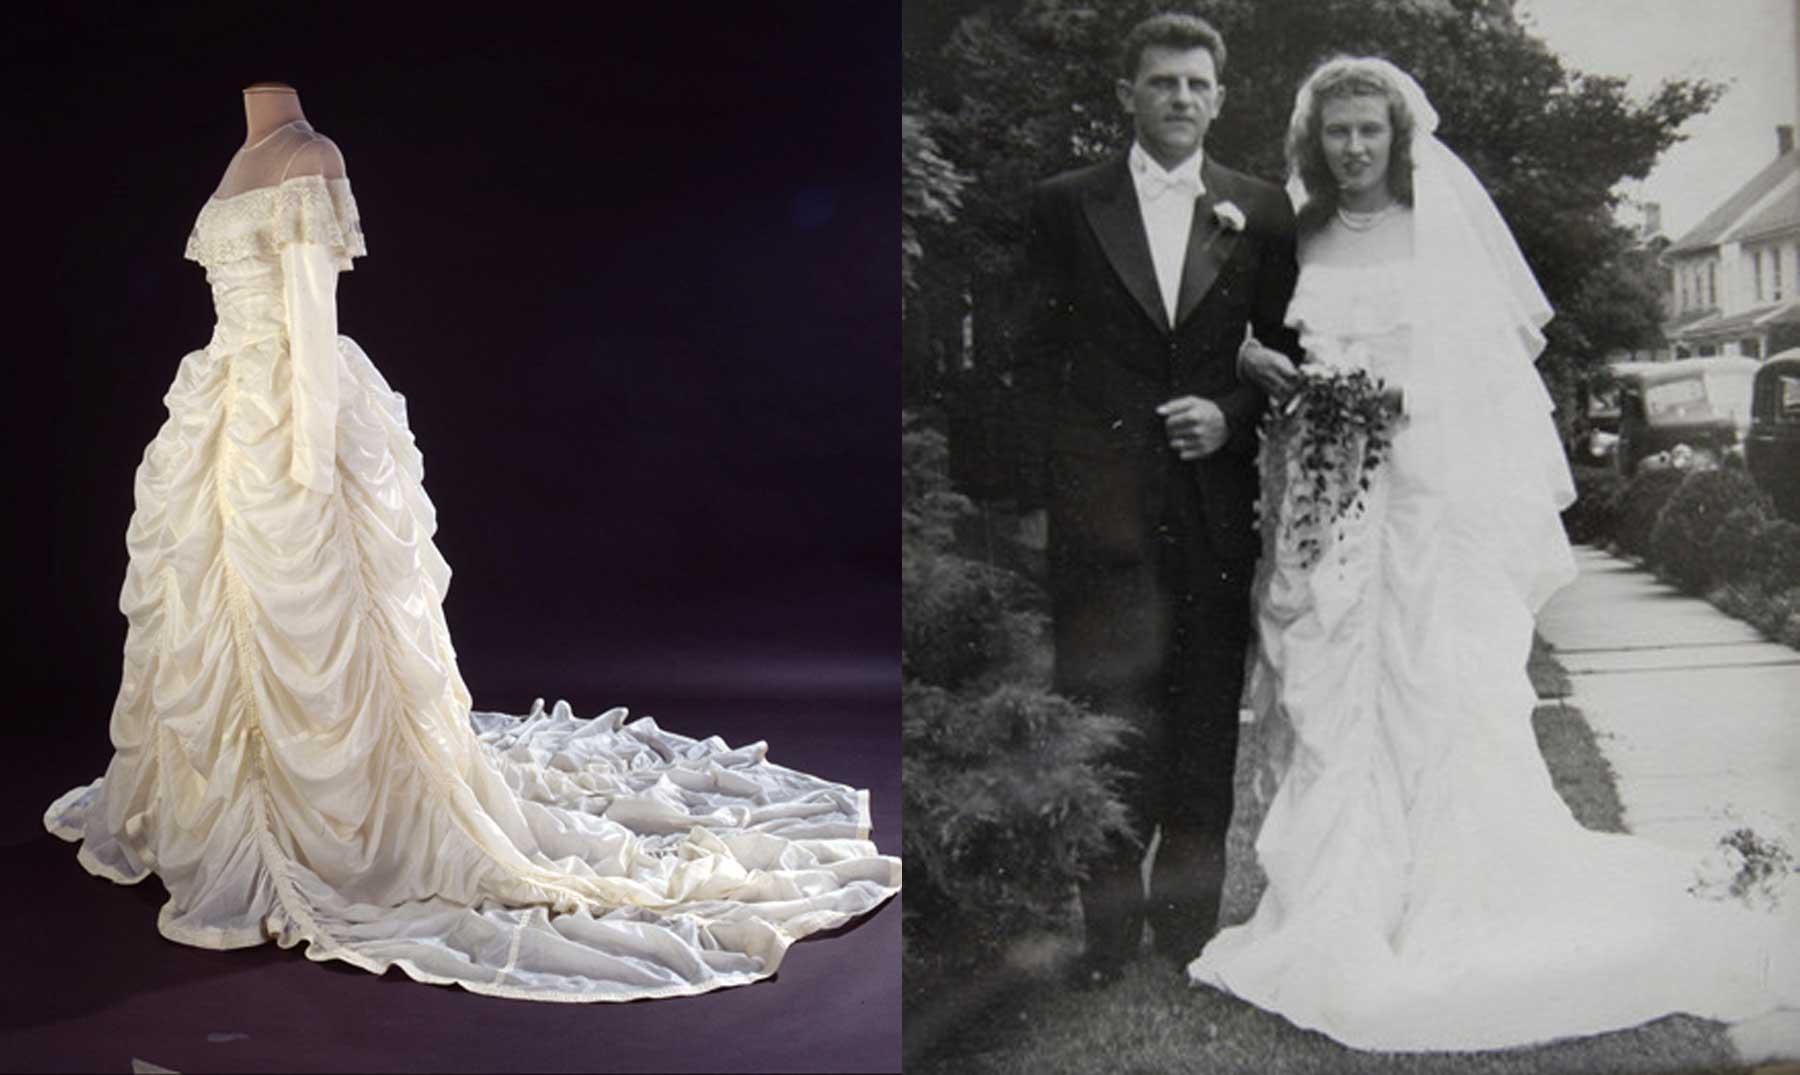 Vestido de novia su historia